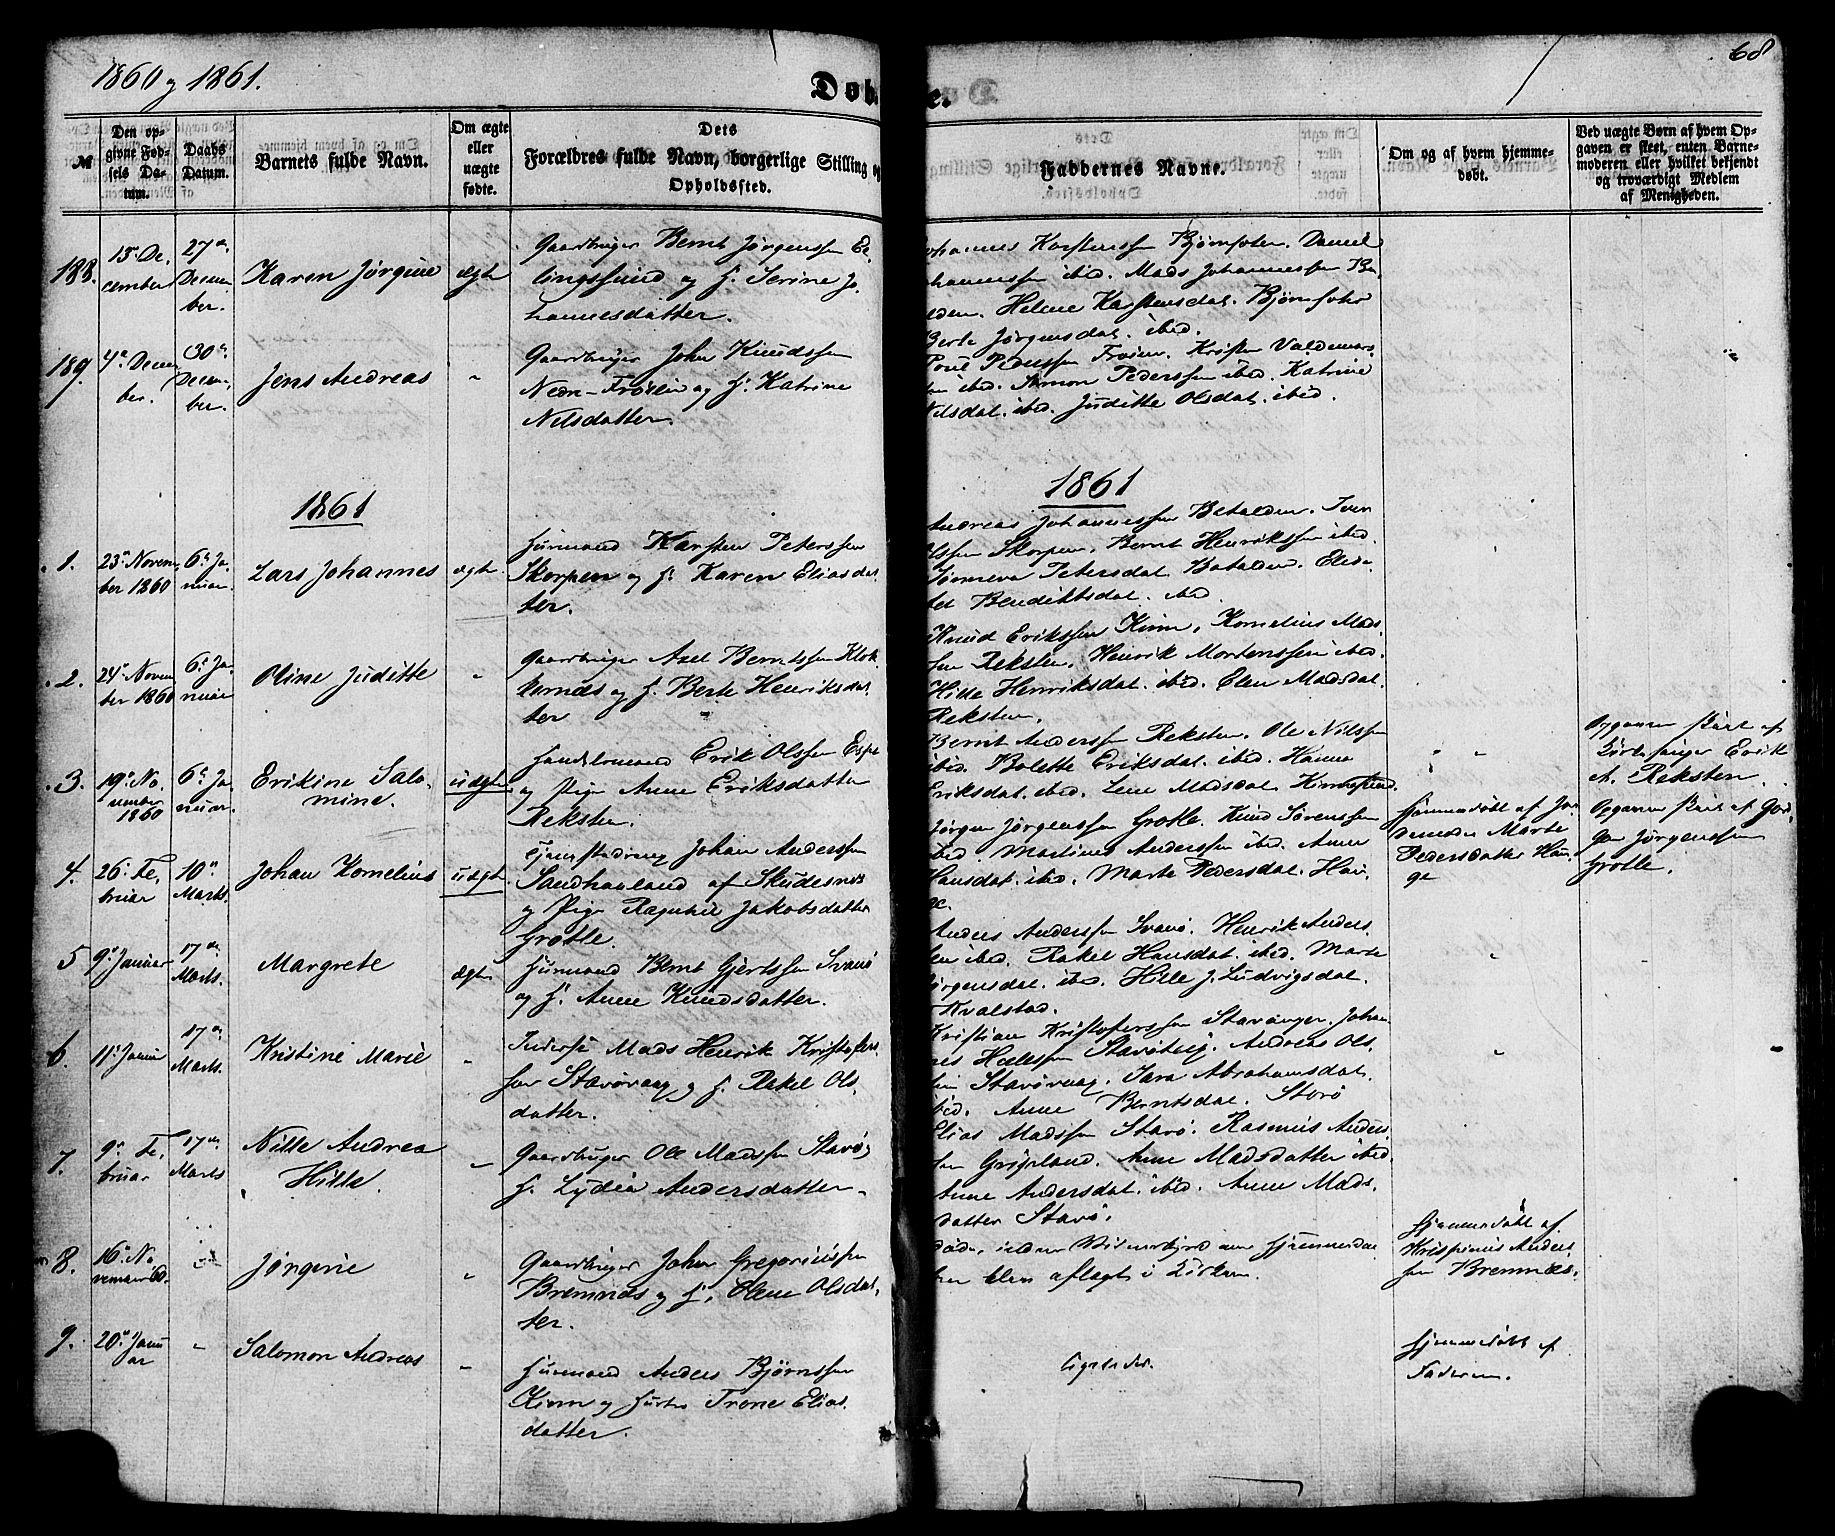 SAB, Kinn sokneprestembete, H/Haa/Haaa/L0006: Parish register (official) no. A 6, 1857-1885, p. 68